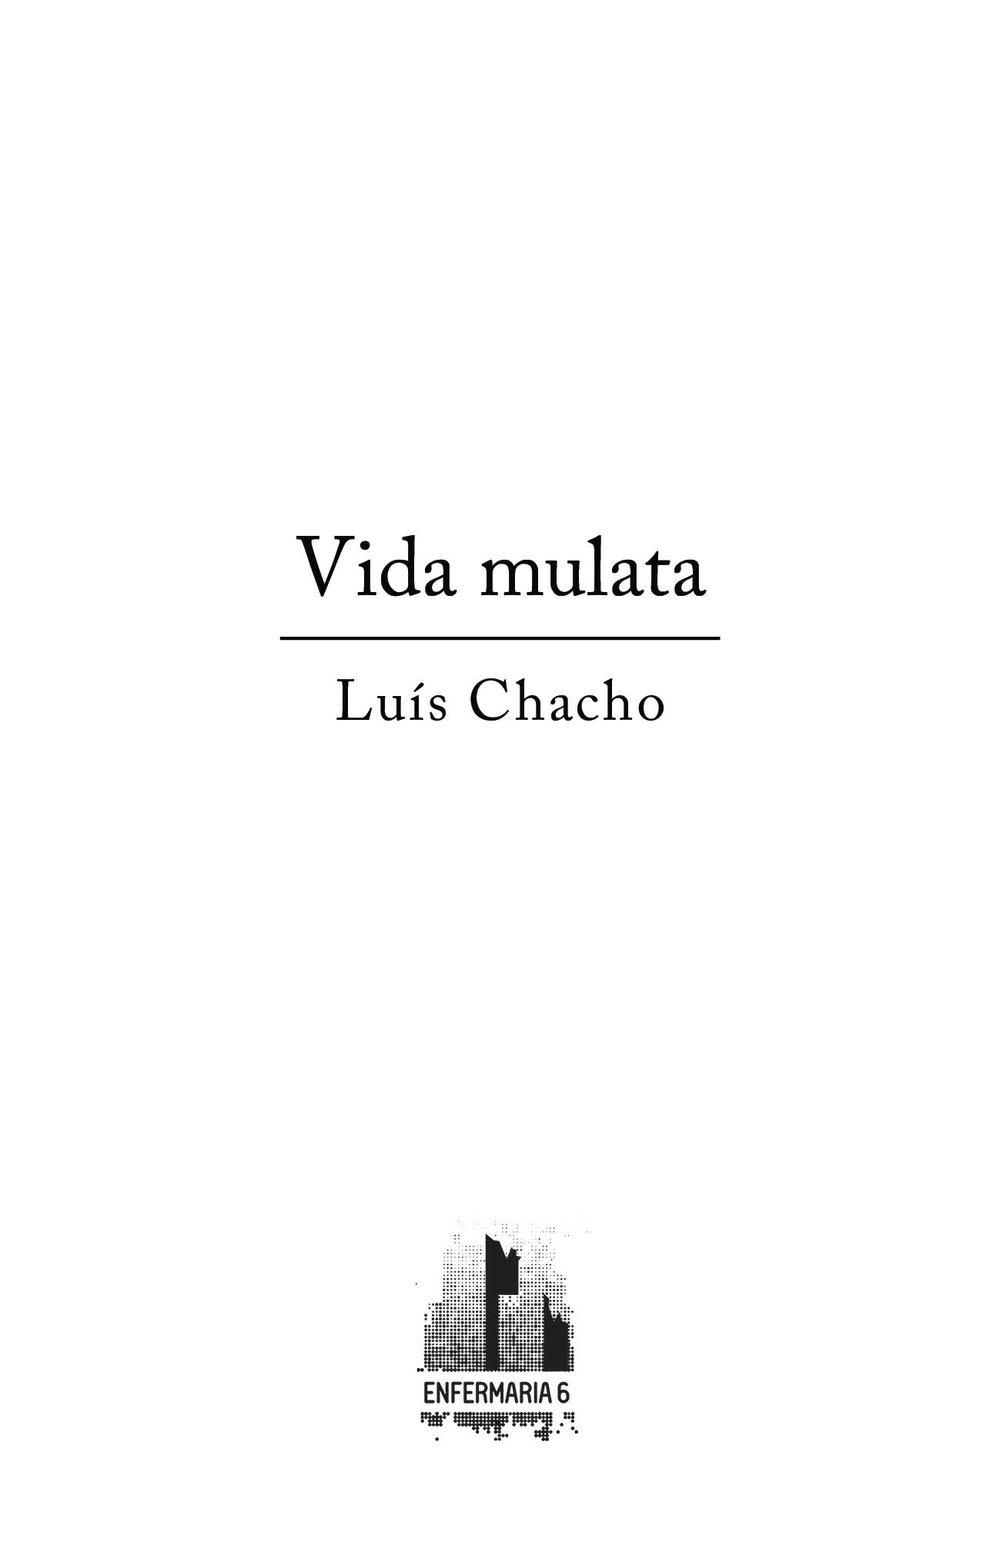 Luís Chacho, vida mulata, Setembro de 2017 (online)